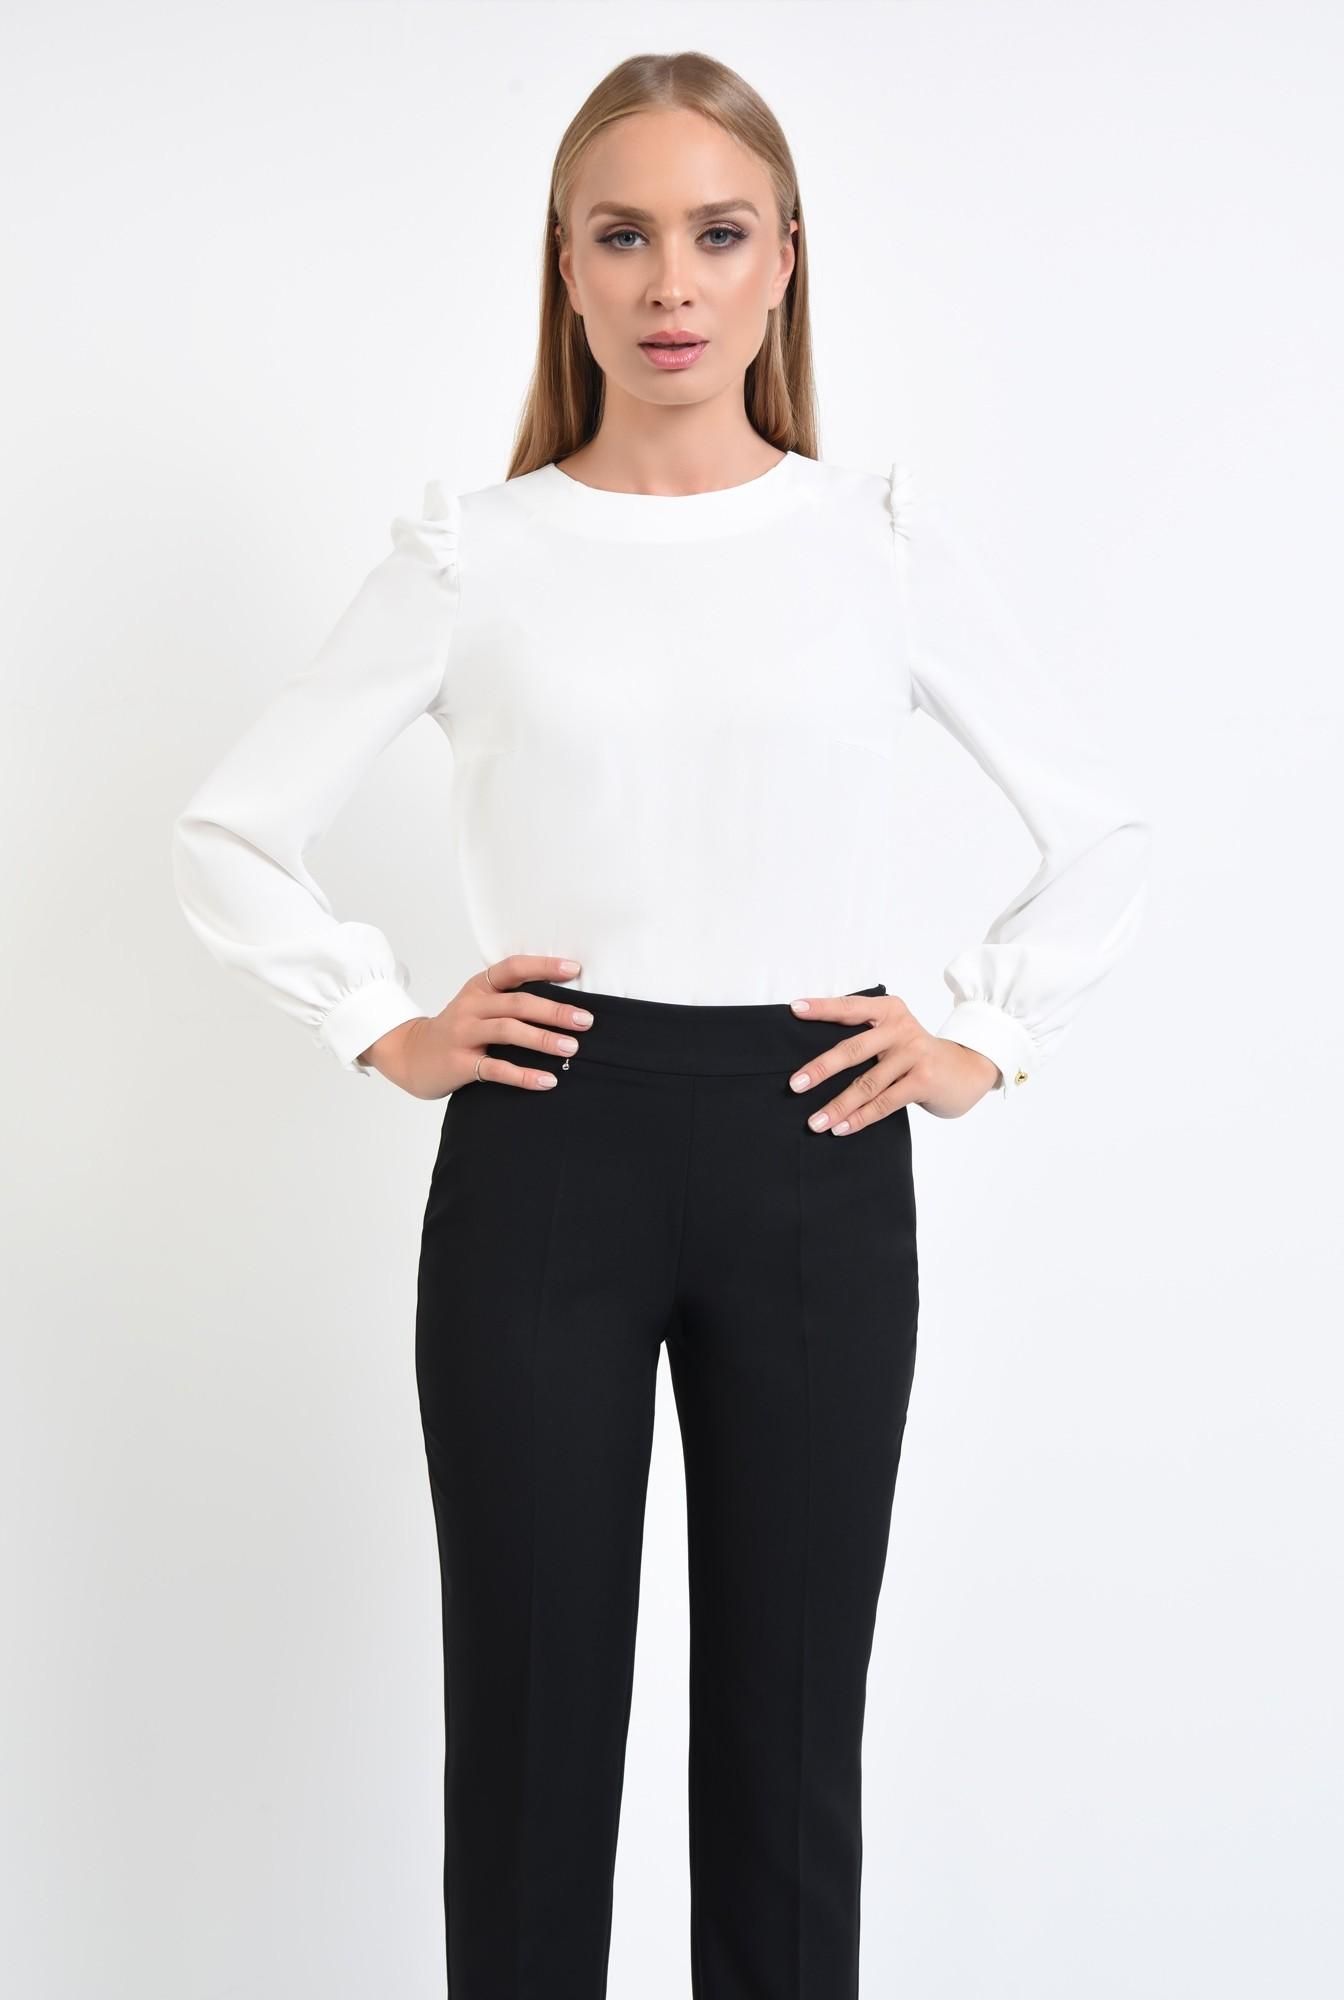 0 - 360 - bluza lejera, croi drept, maneci bufante, spate babydoll, pliuri, bluze online